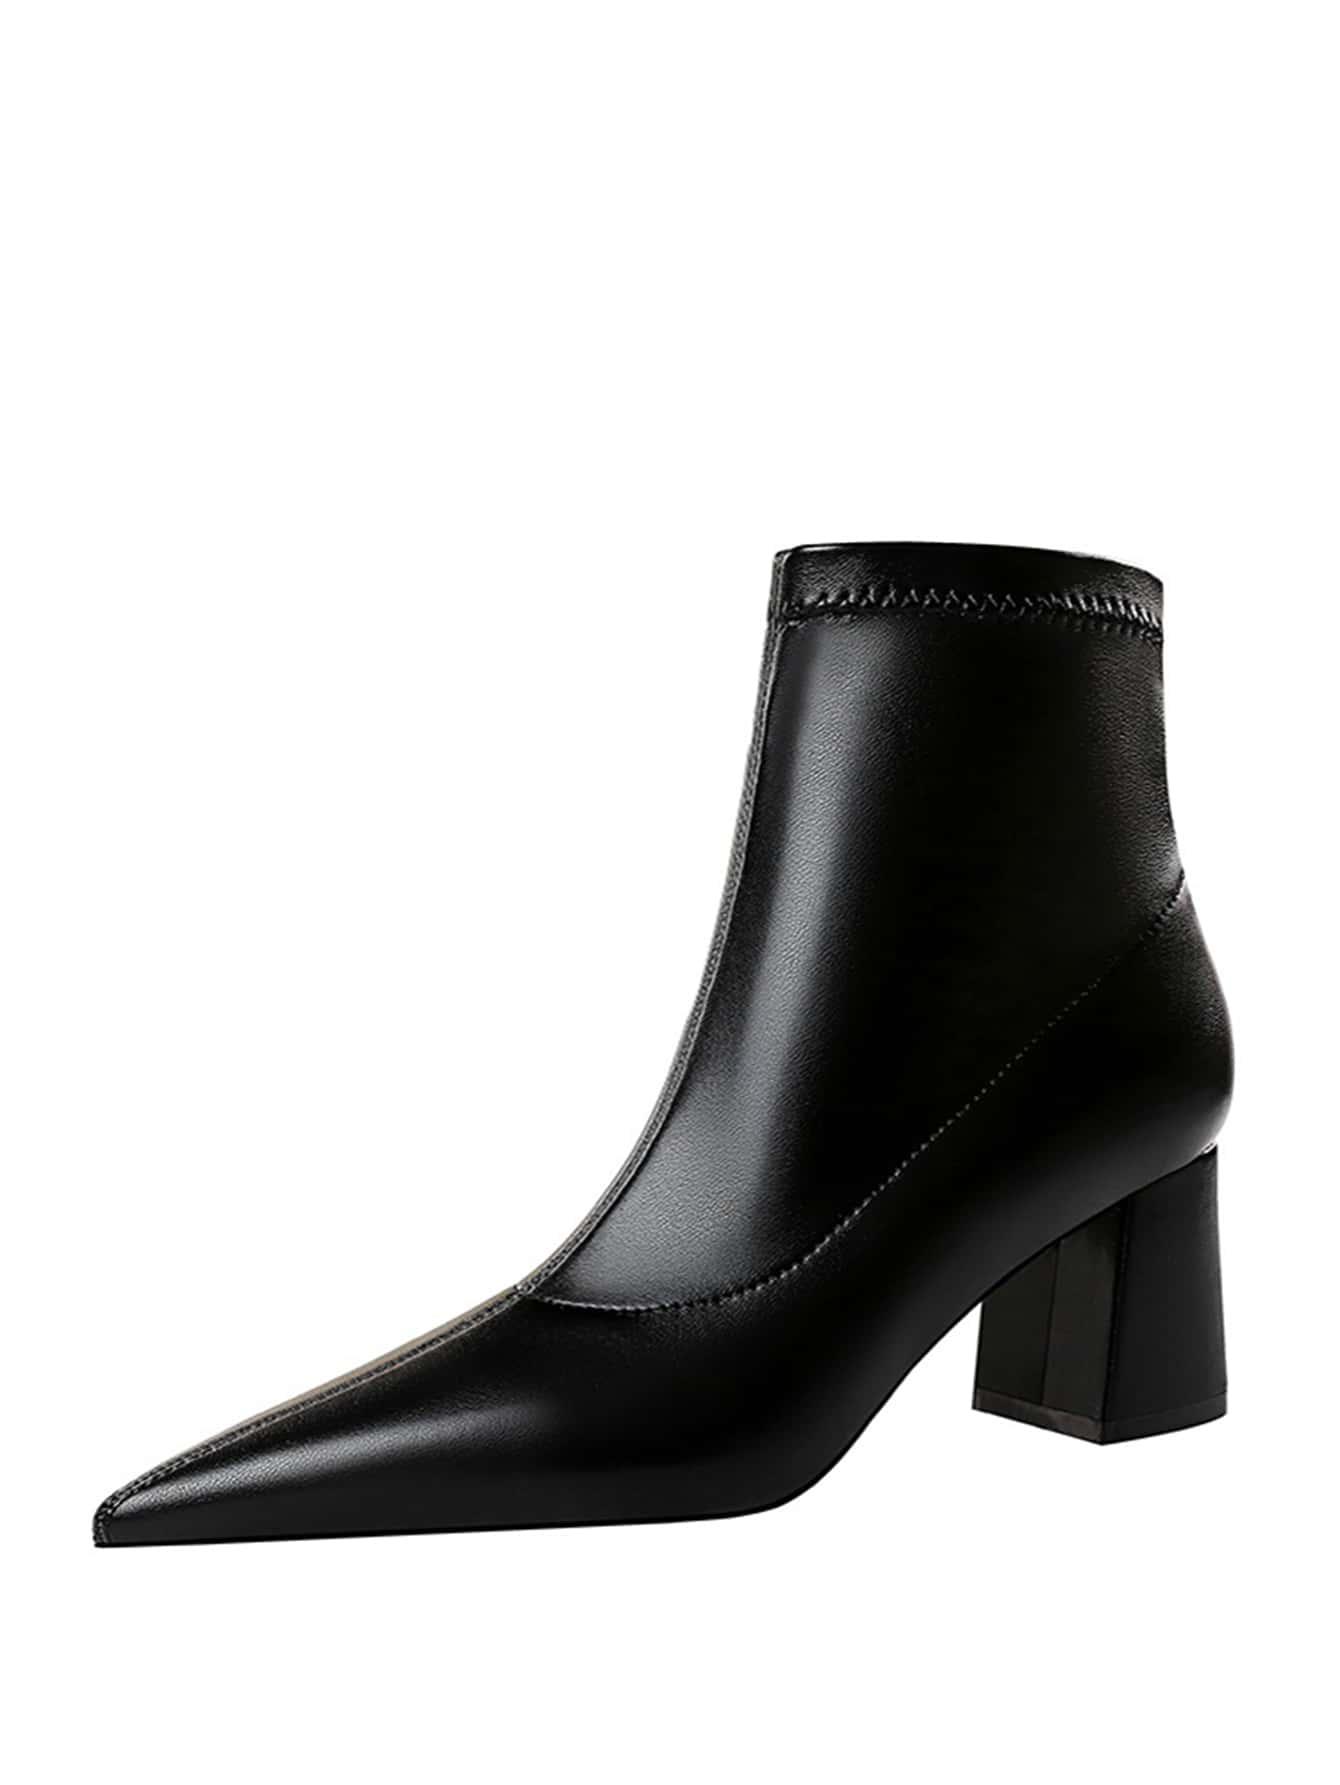 Point Toe Chunky Heeled Boots